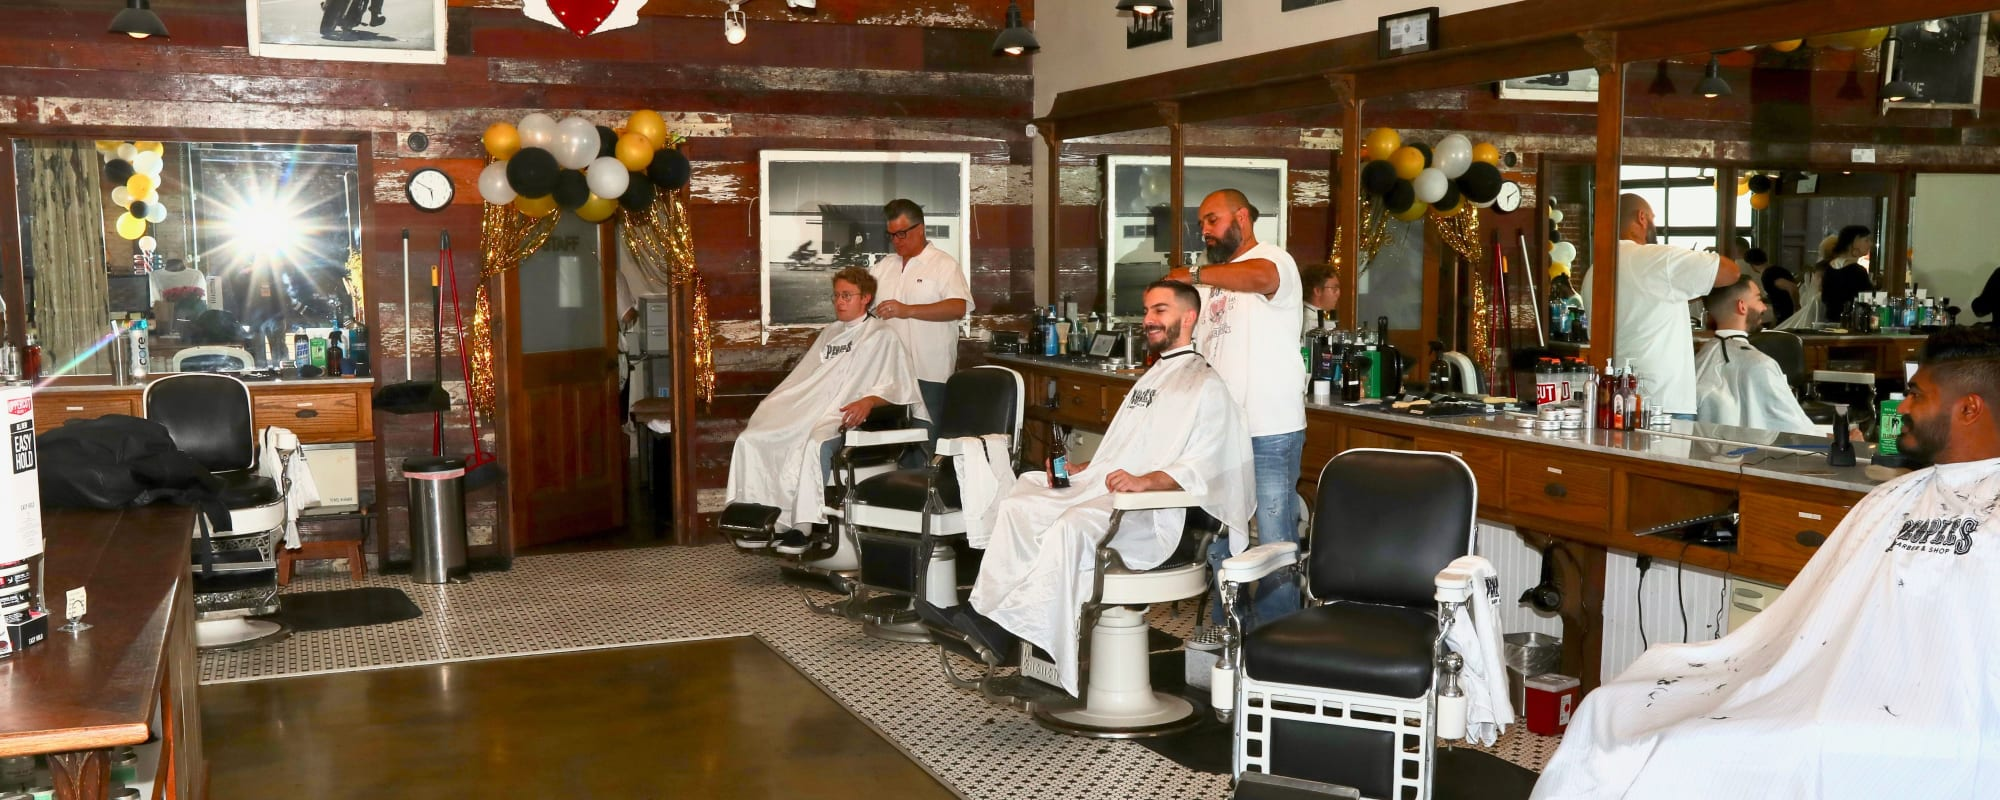 Barber shop near The Moran in Oakland, California